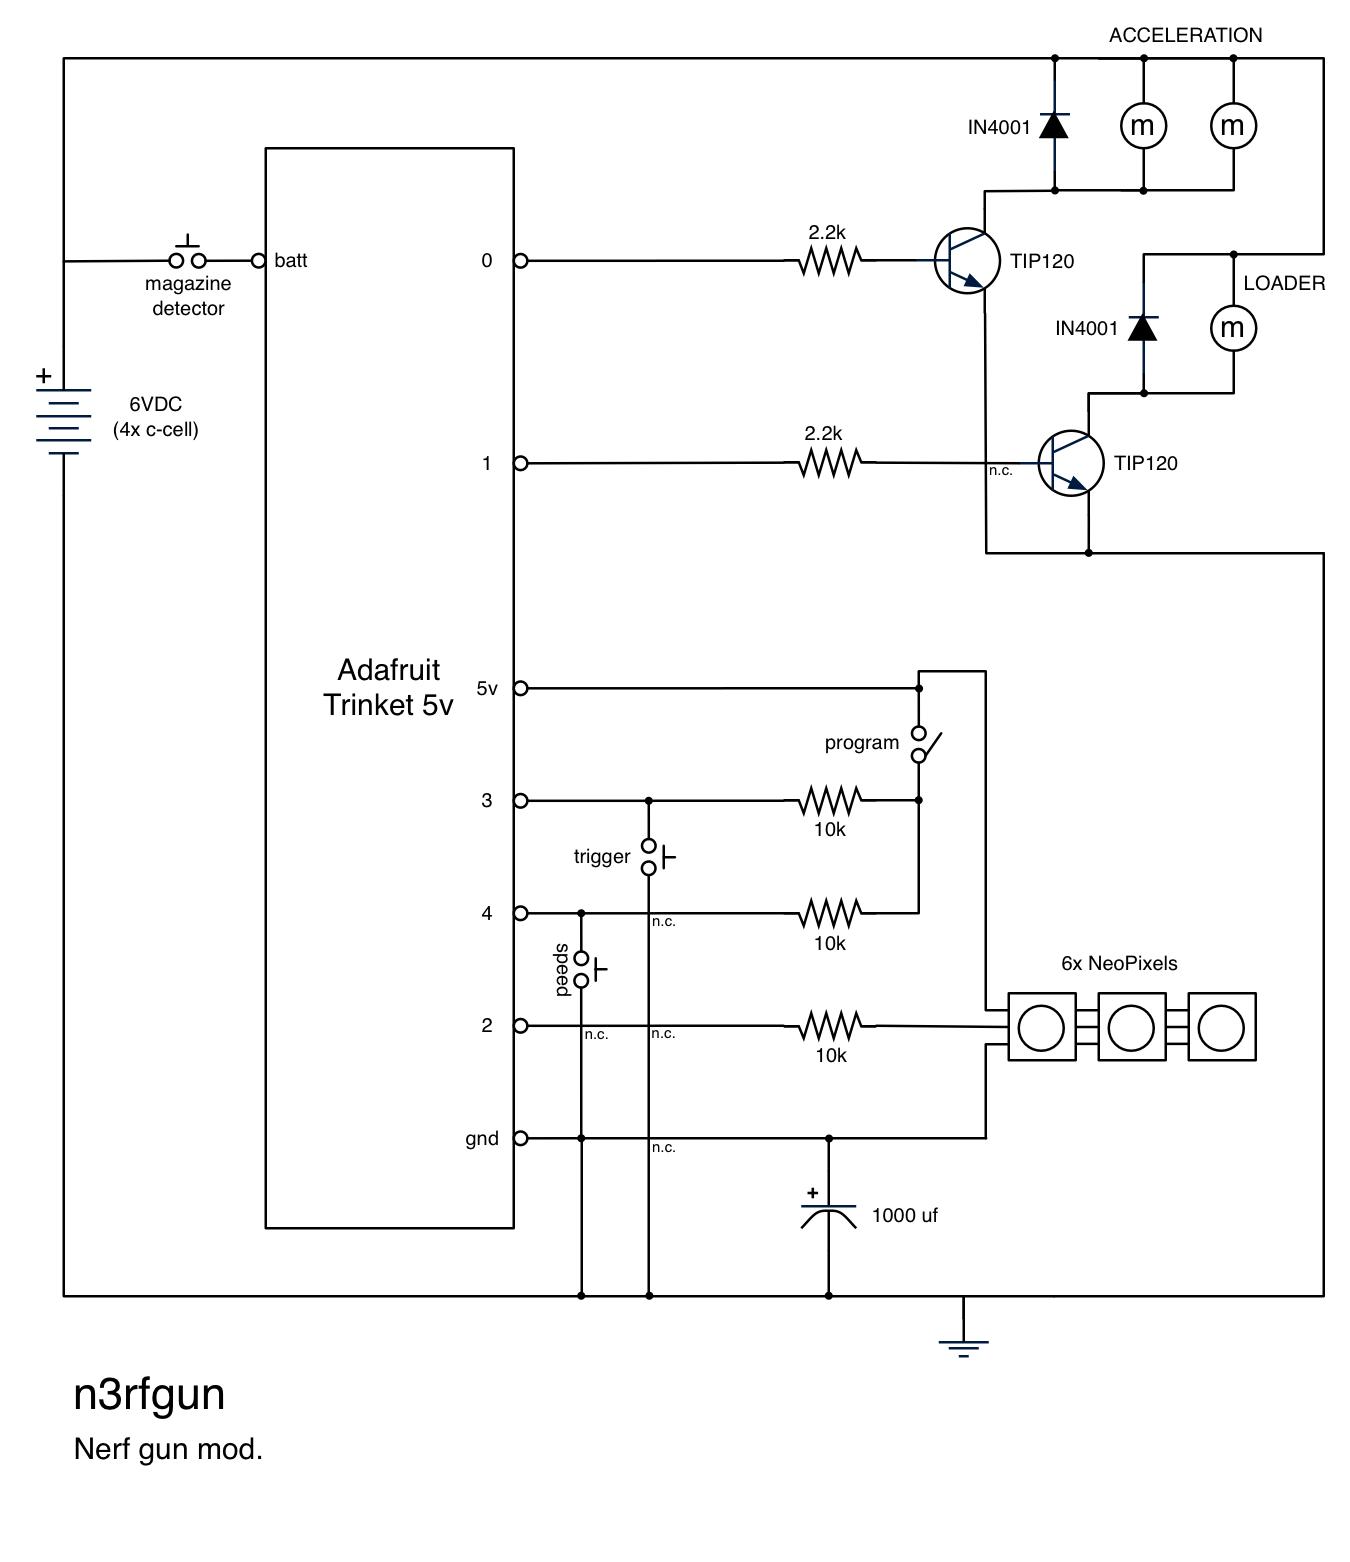 hacks_n3rfgun_schematic.png